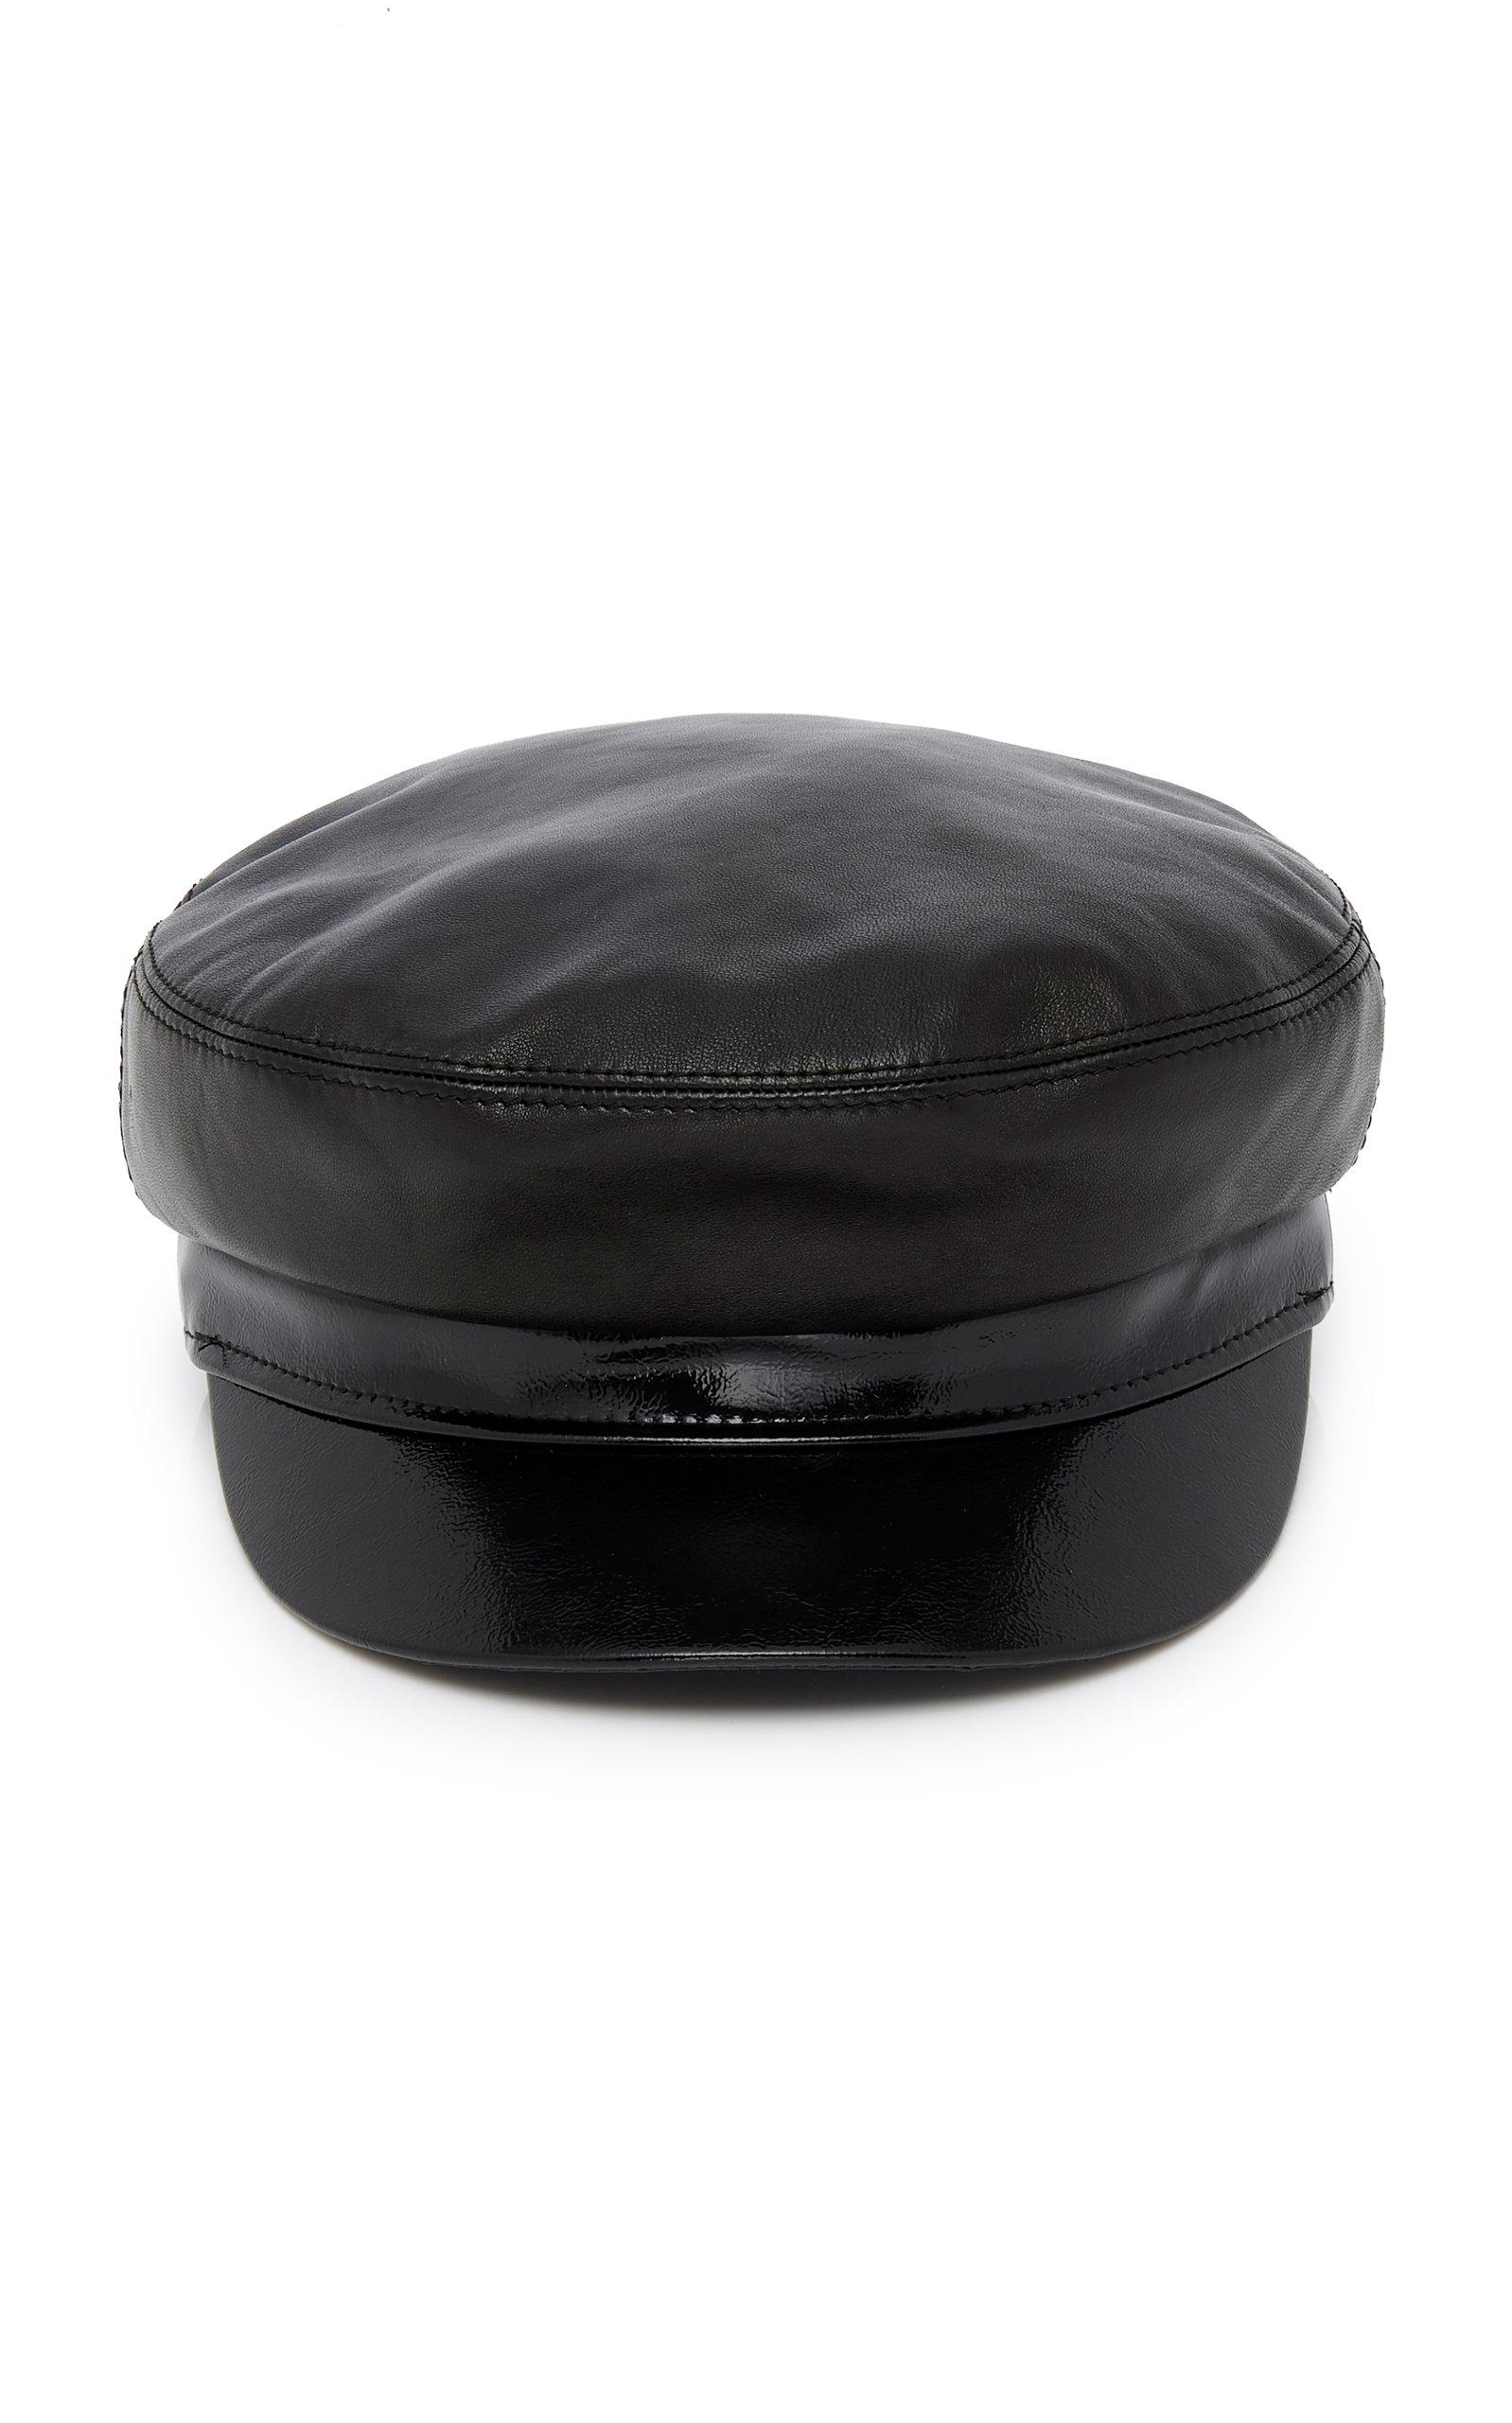 AVEC LA TROUPE M'O Exclusive Majorette Smooth And Patent-Leather Cap in Black